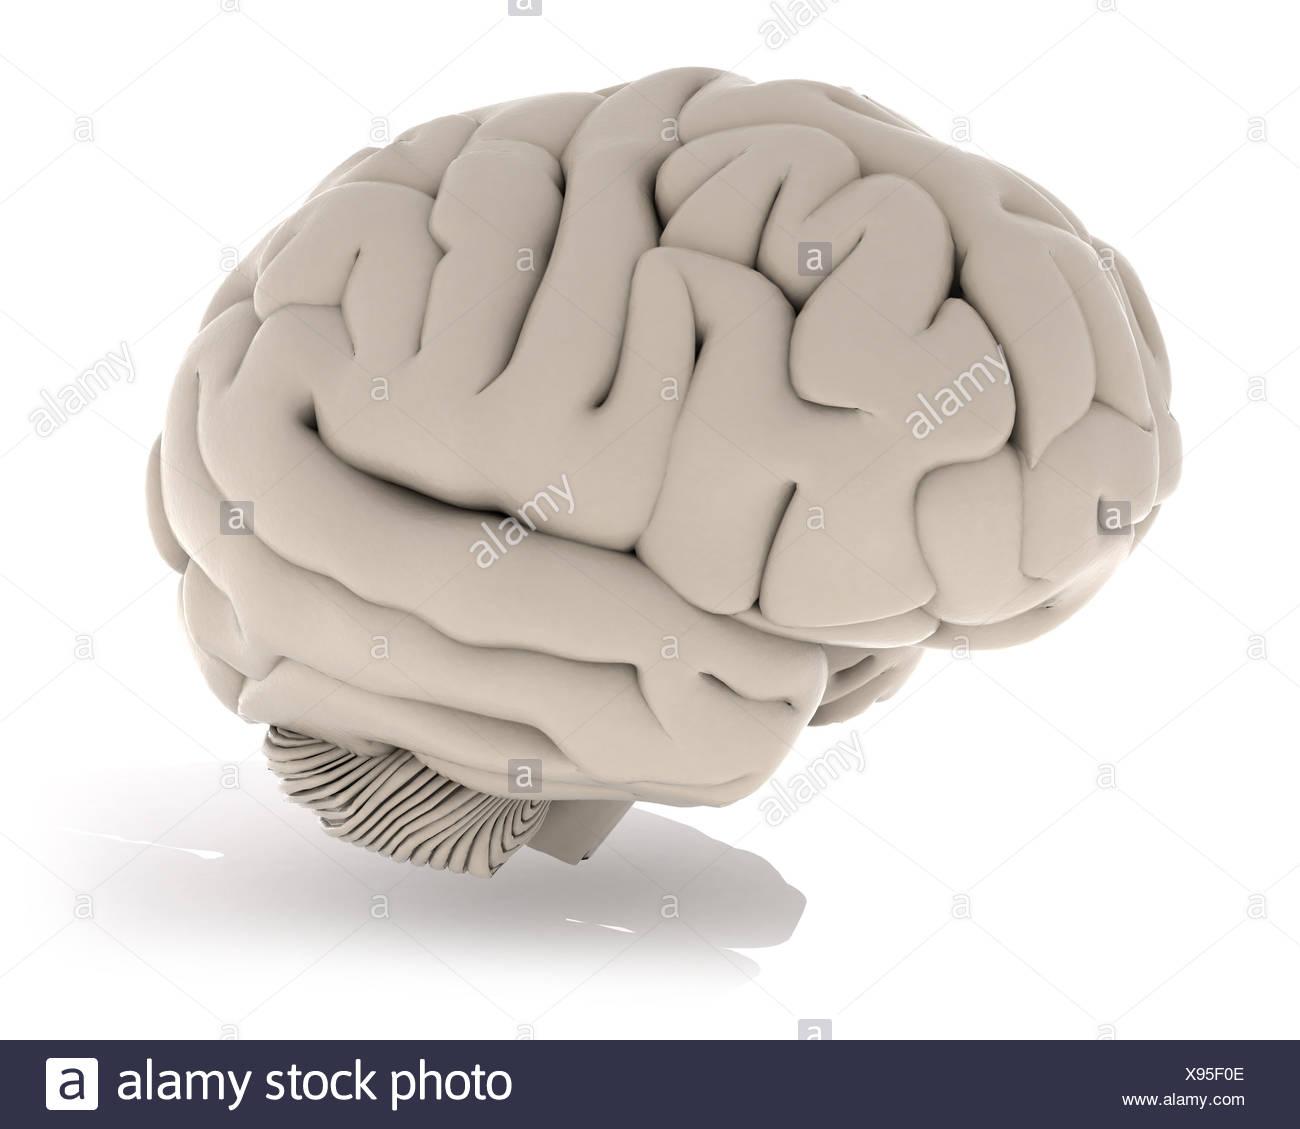 Illustration of a cerebrum - Stock Image